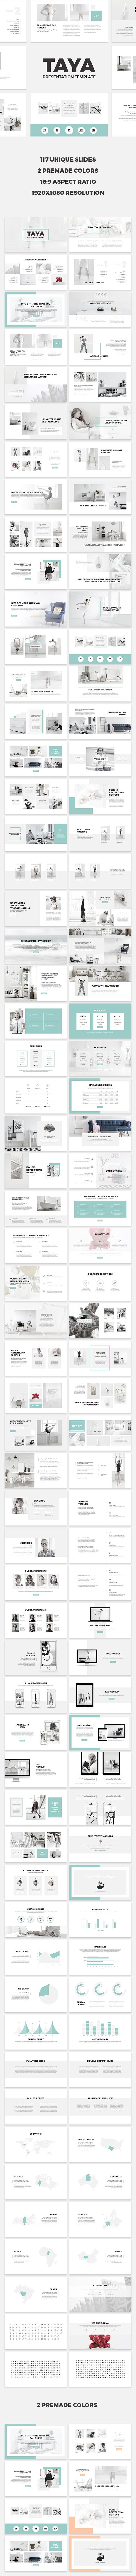 Taya PowerPoint Template - PowerPoint Templates Presentation Templates